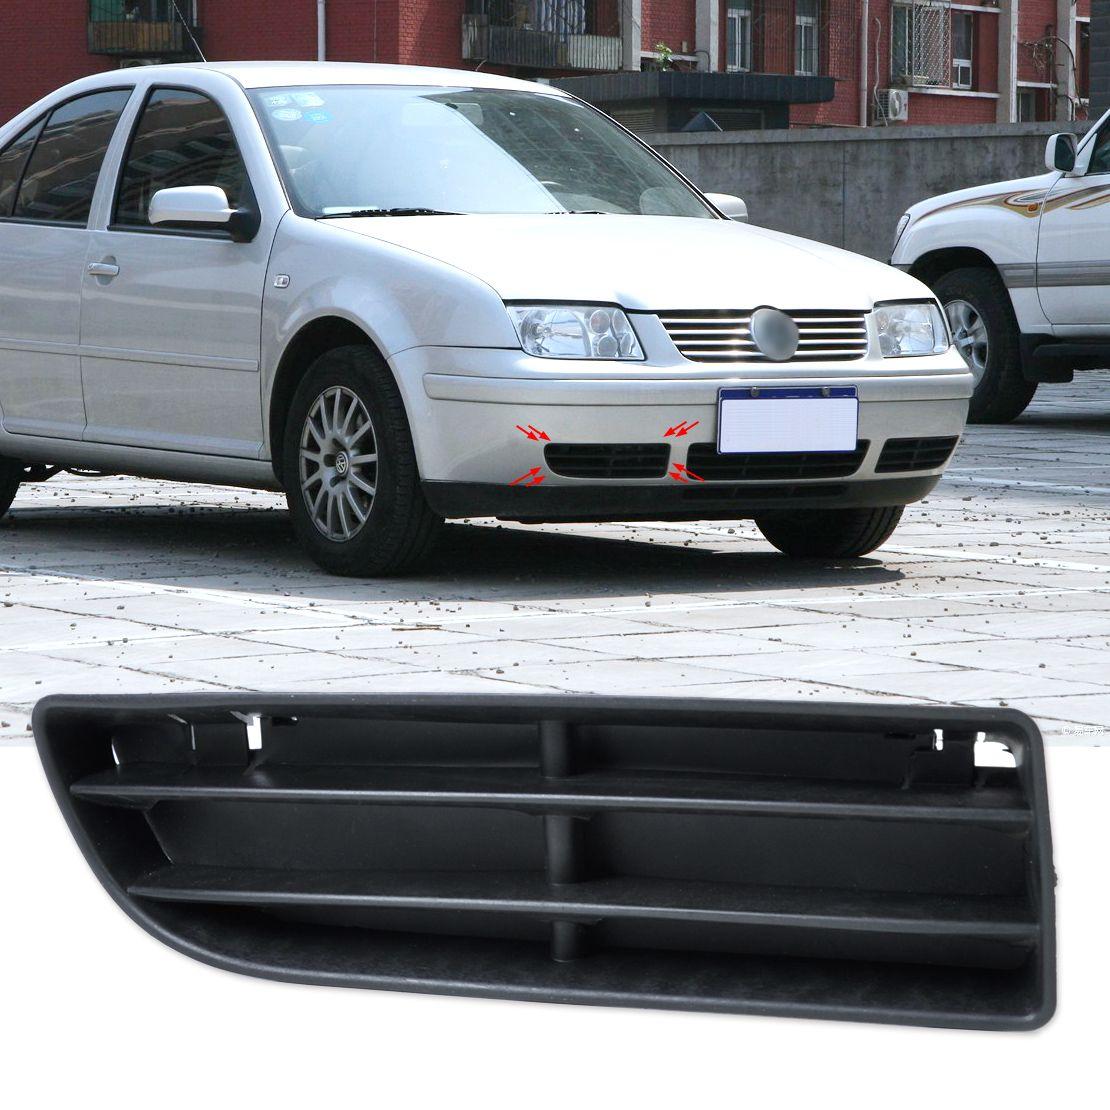 Dwcx 1j5853666c Front Right Bumper Lower Grill Vent For Vw Volkswagen Jetta Bora Mk4 1999 2000 2001 2002 2003 2004 Volkswagen Jetta Vw Volkswagen Volkswagen